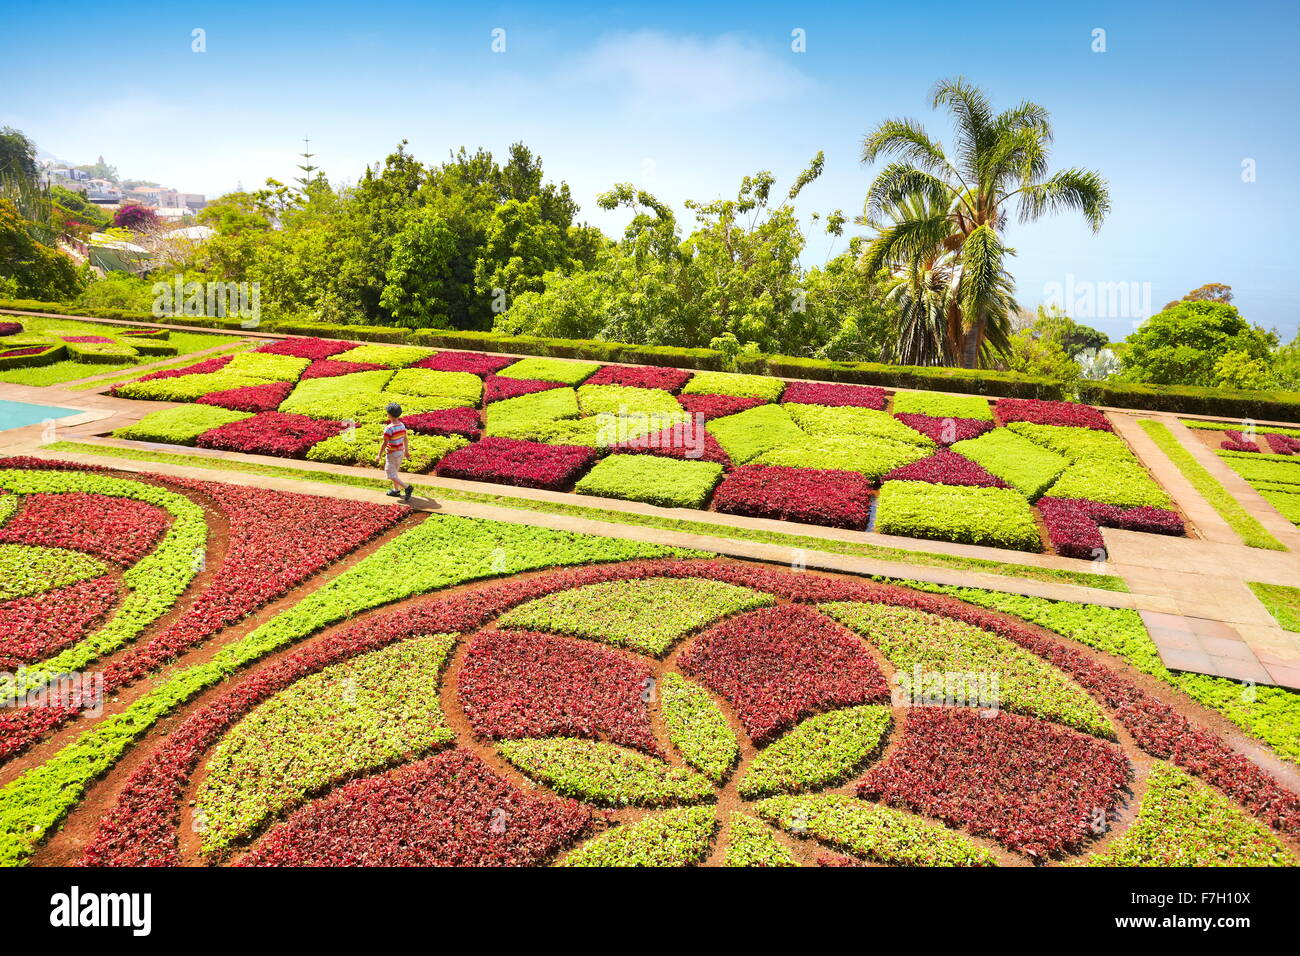 The Madeira Botanical Garden - Funchal, Madeira, Portugal - Stock Image